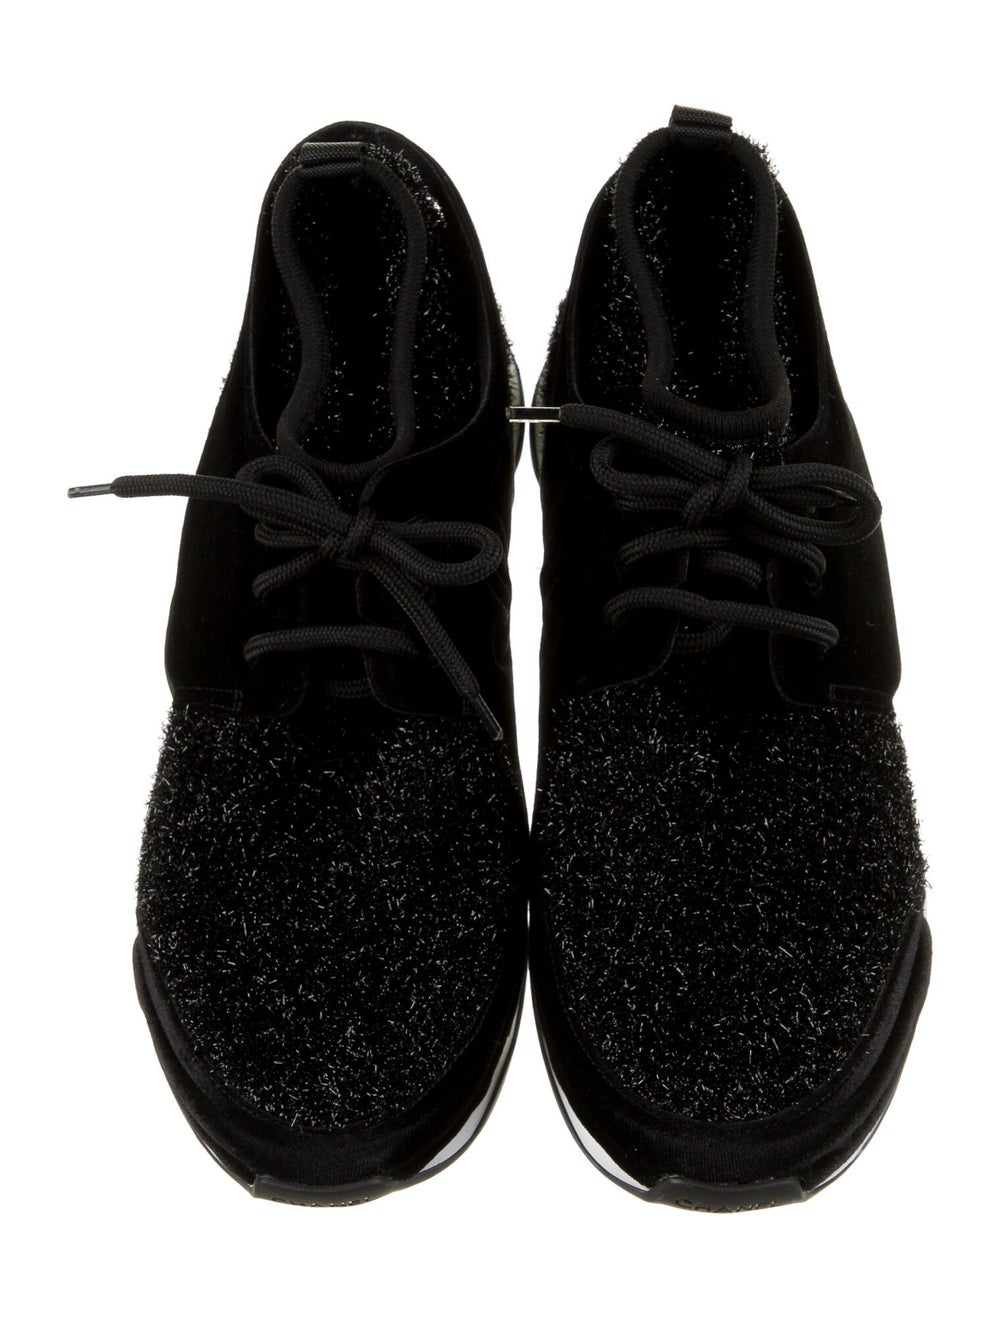 Chanel Tinsel Sock Sneakers Sneakers Black - image 3